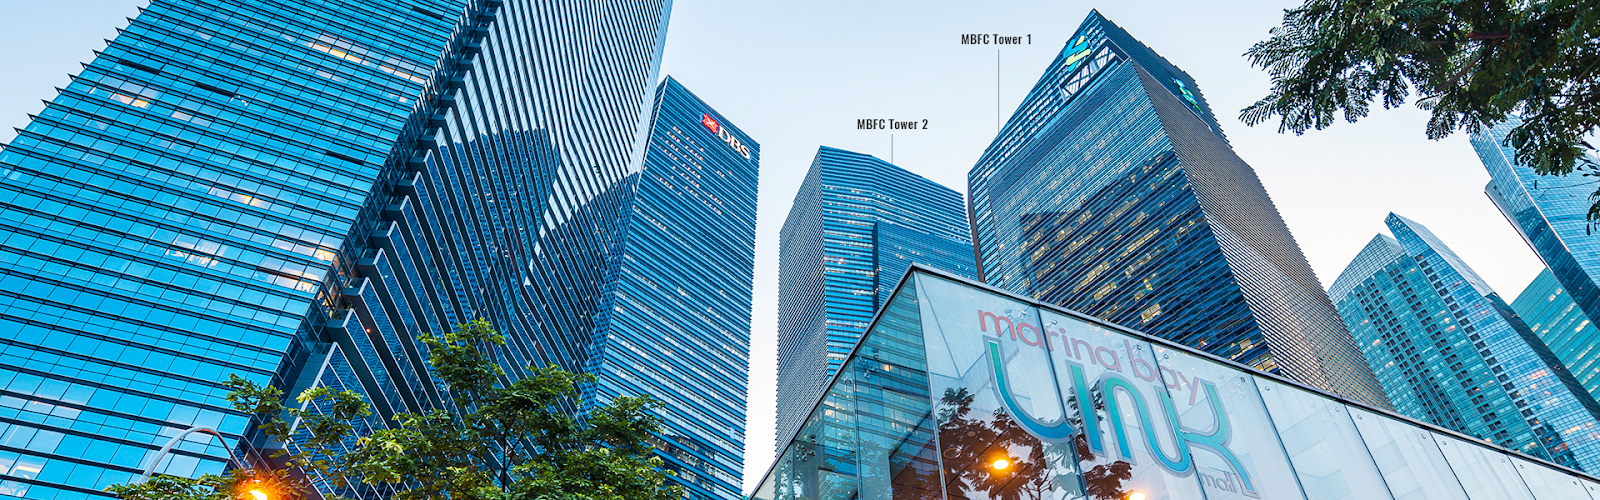 Suntec REIT - Singapore Property, Marina Bay Financial Centre (MBFC)